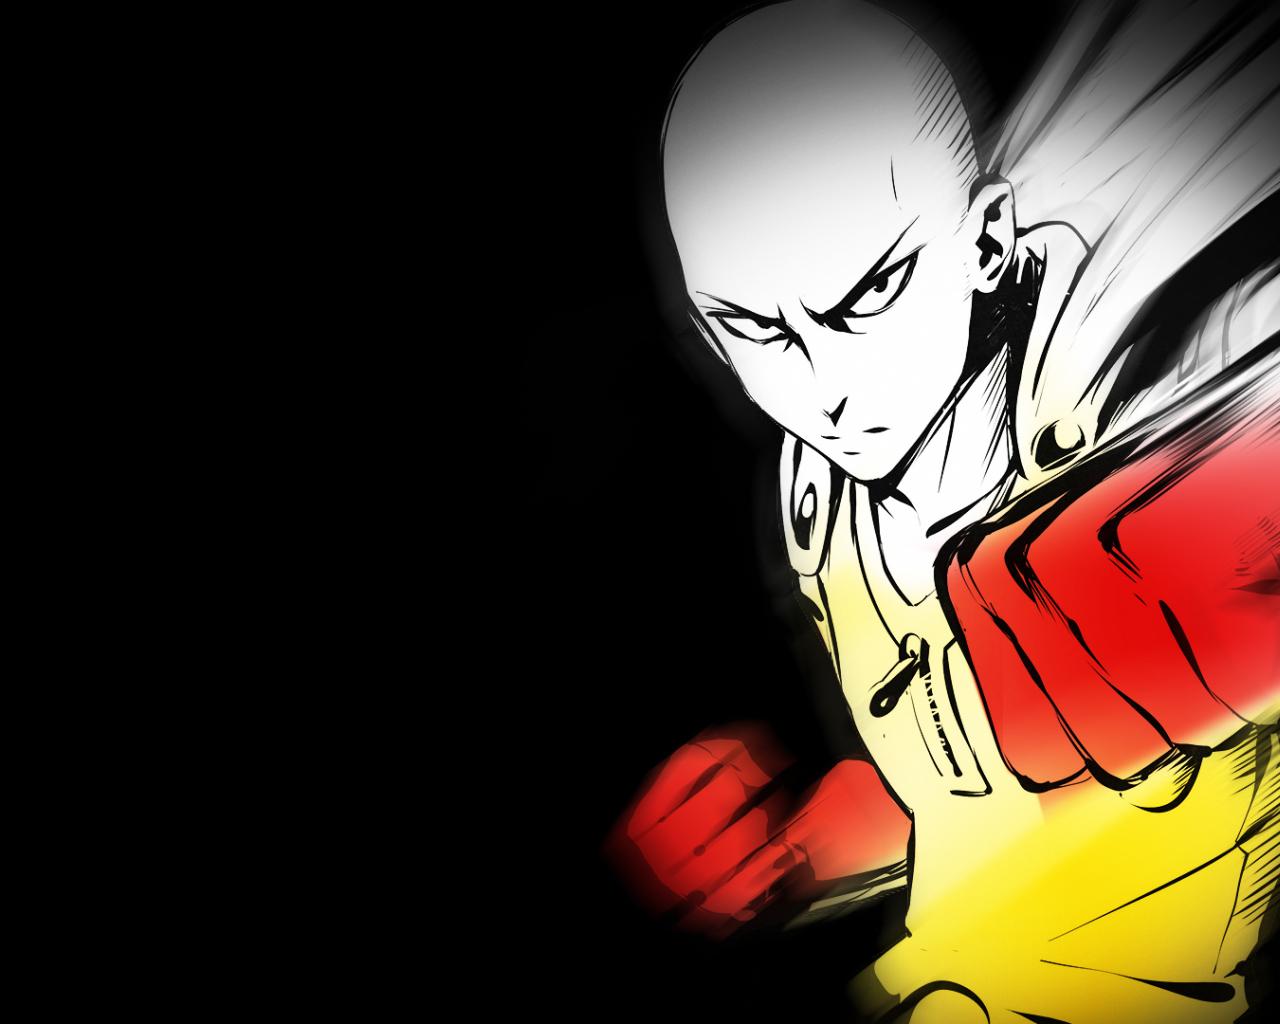 1280x1024 One-Punch Man Saitama 1280x1024 Resolution ...